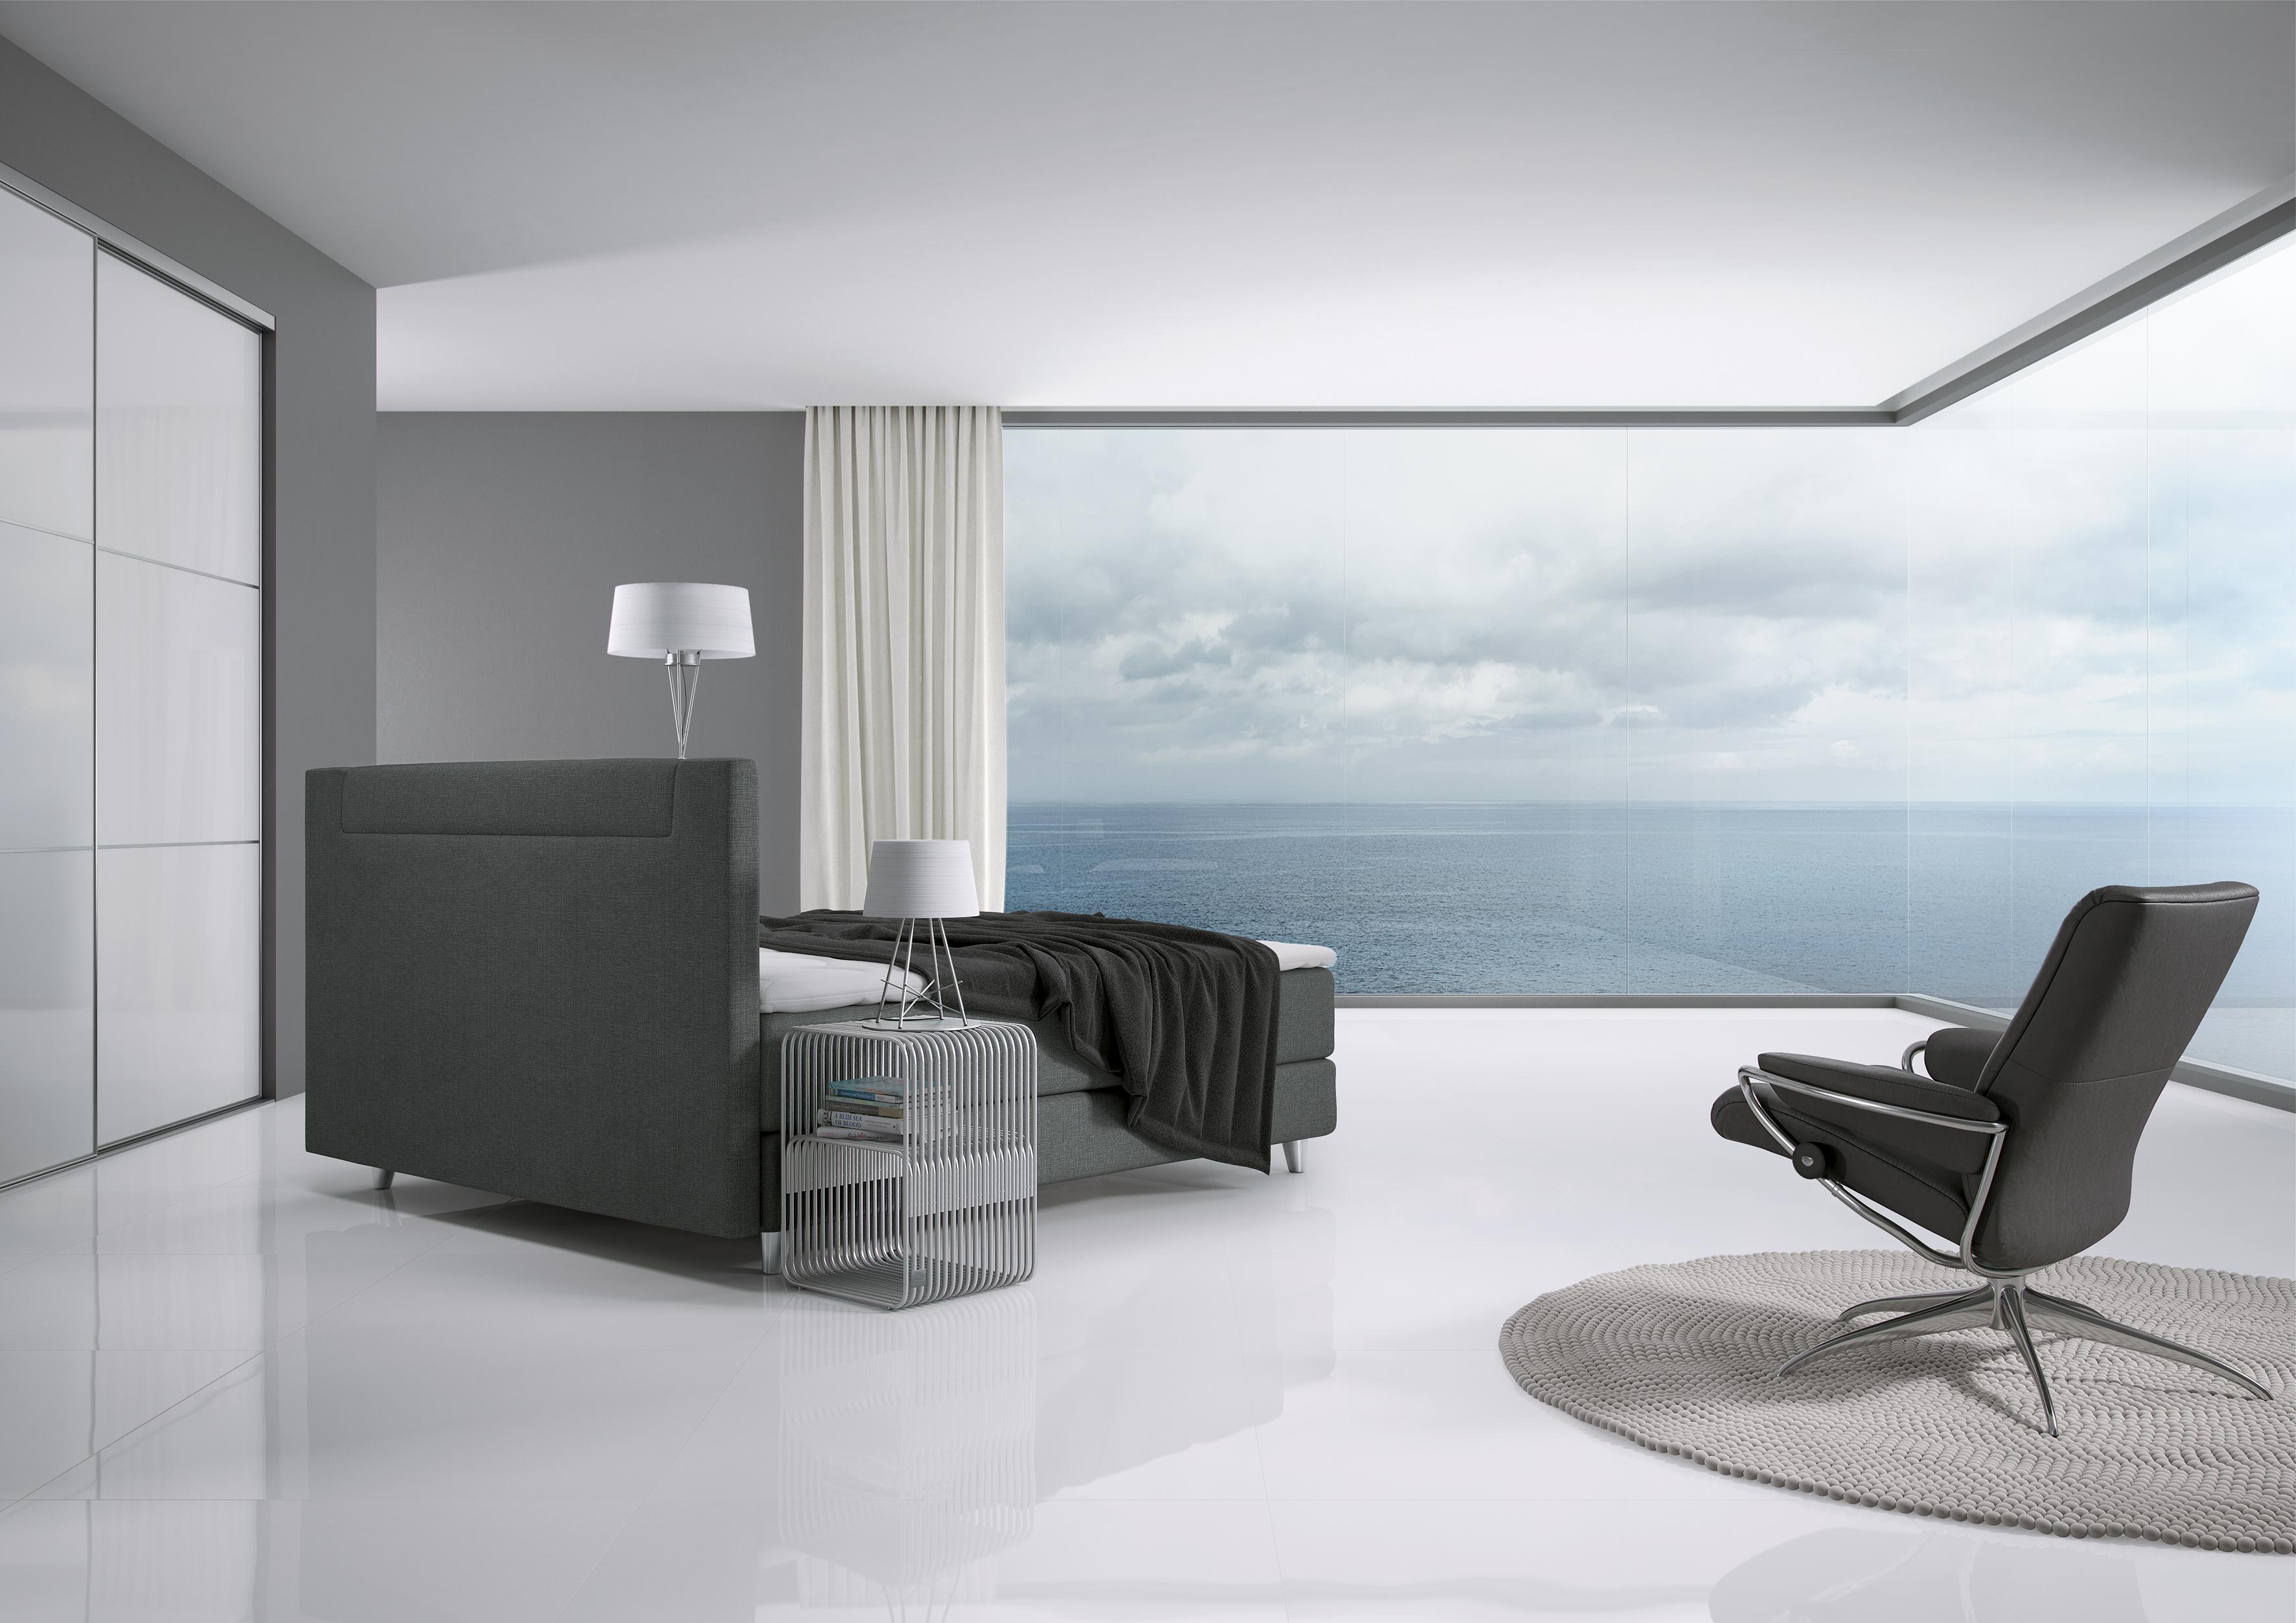 boxspringbetten vor dem esche. Black Bedroom Furniture Sets. Home Design Ideas